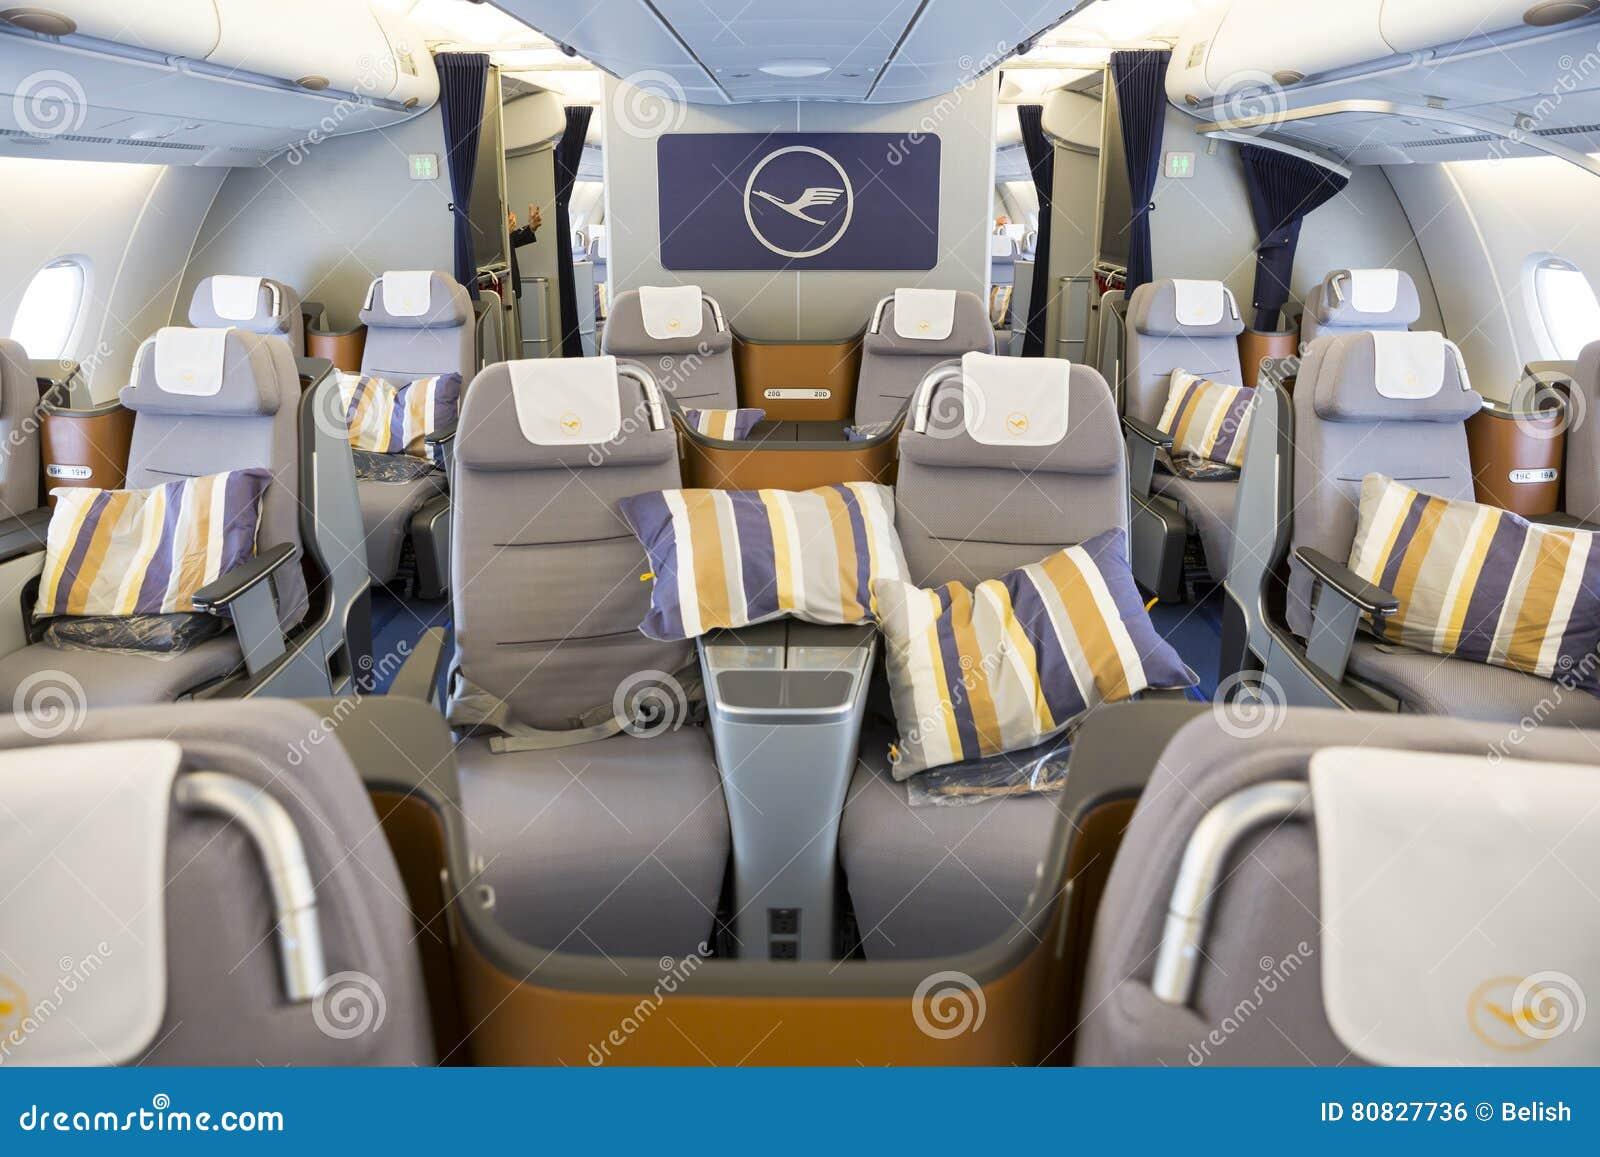 avion d airbus a380 l intrieur